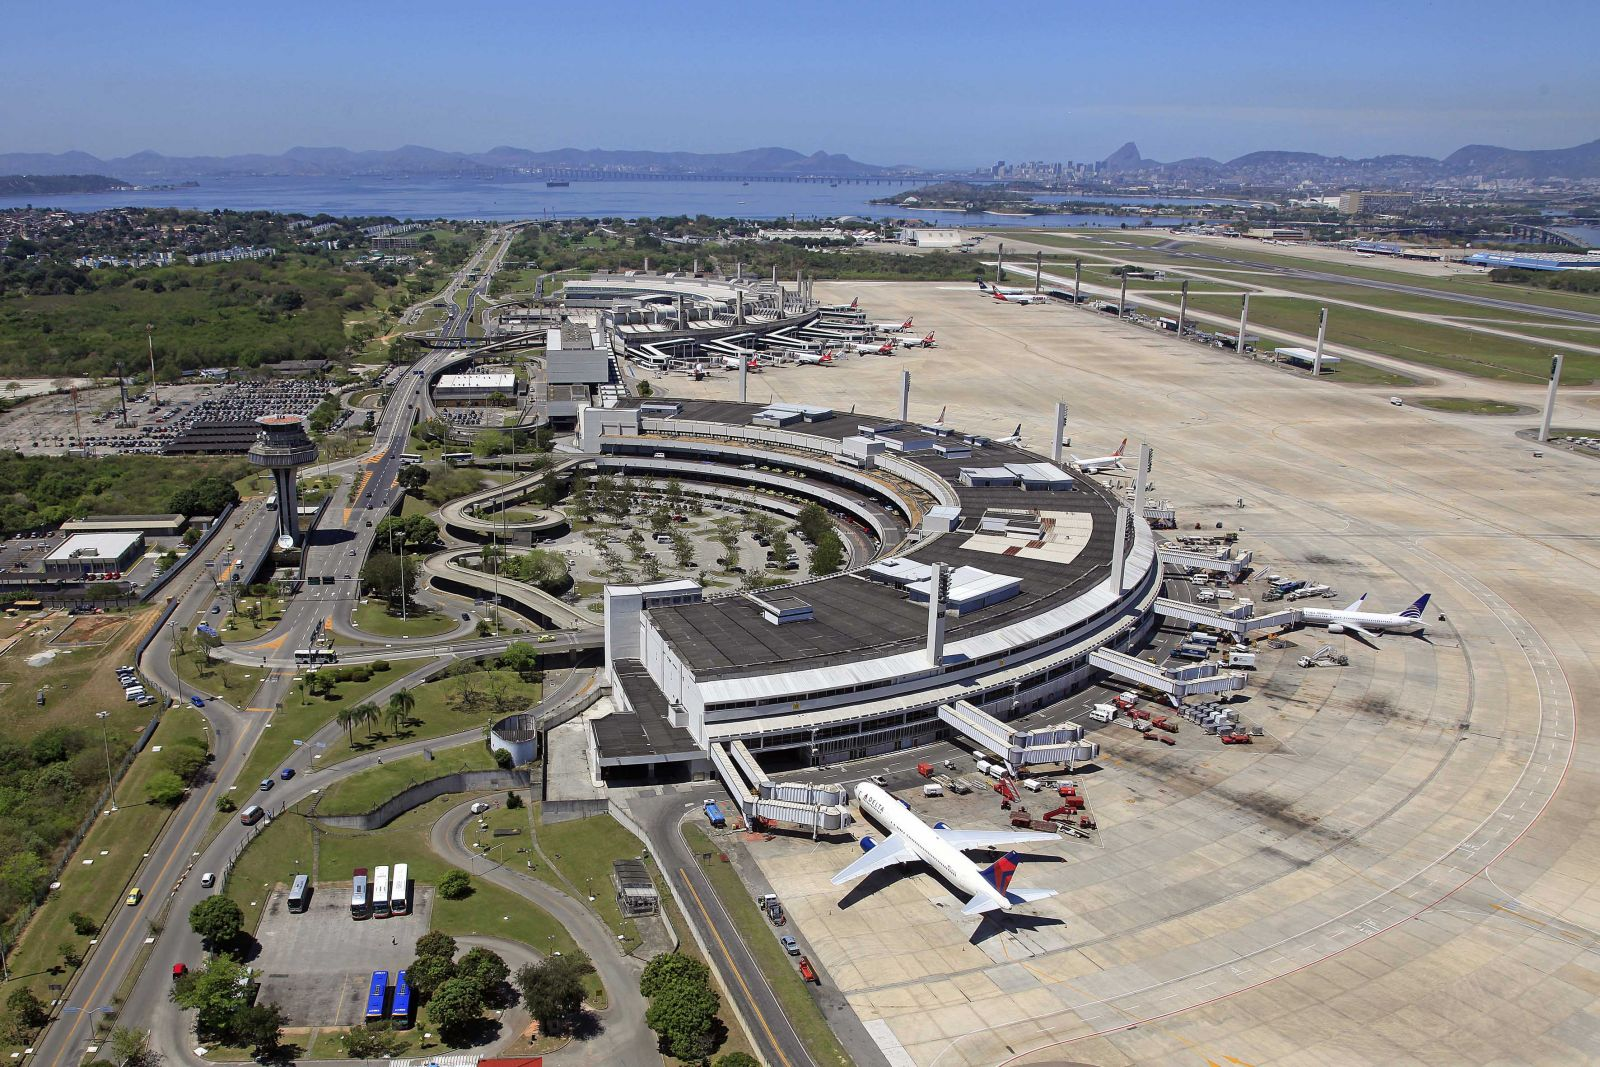 Аэропорт Рио де Жанейро Галеан